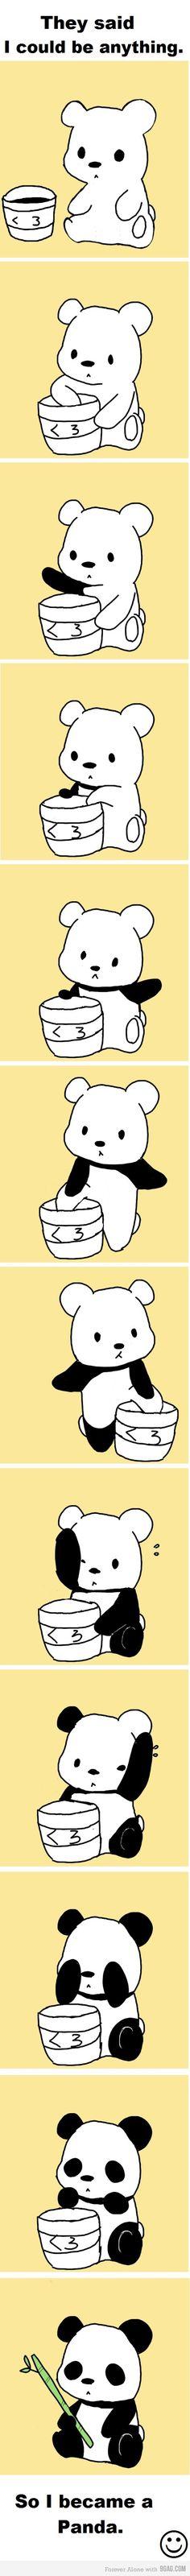 Te dejo panda goofy!